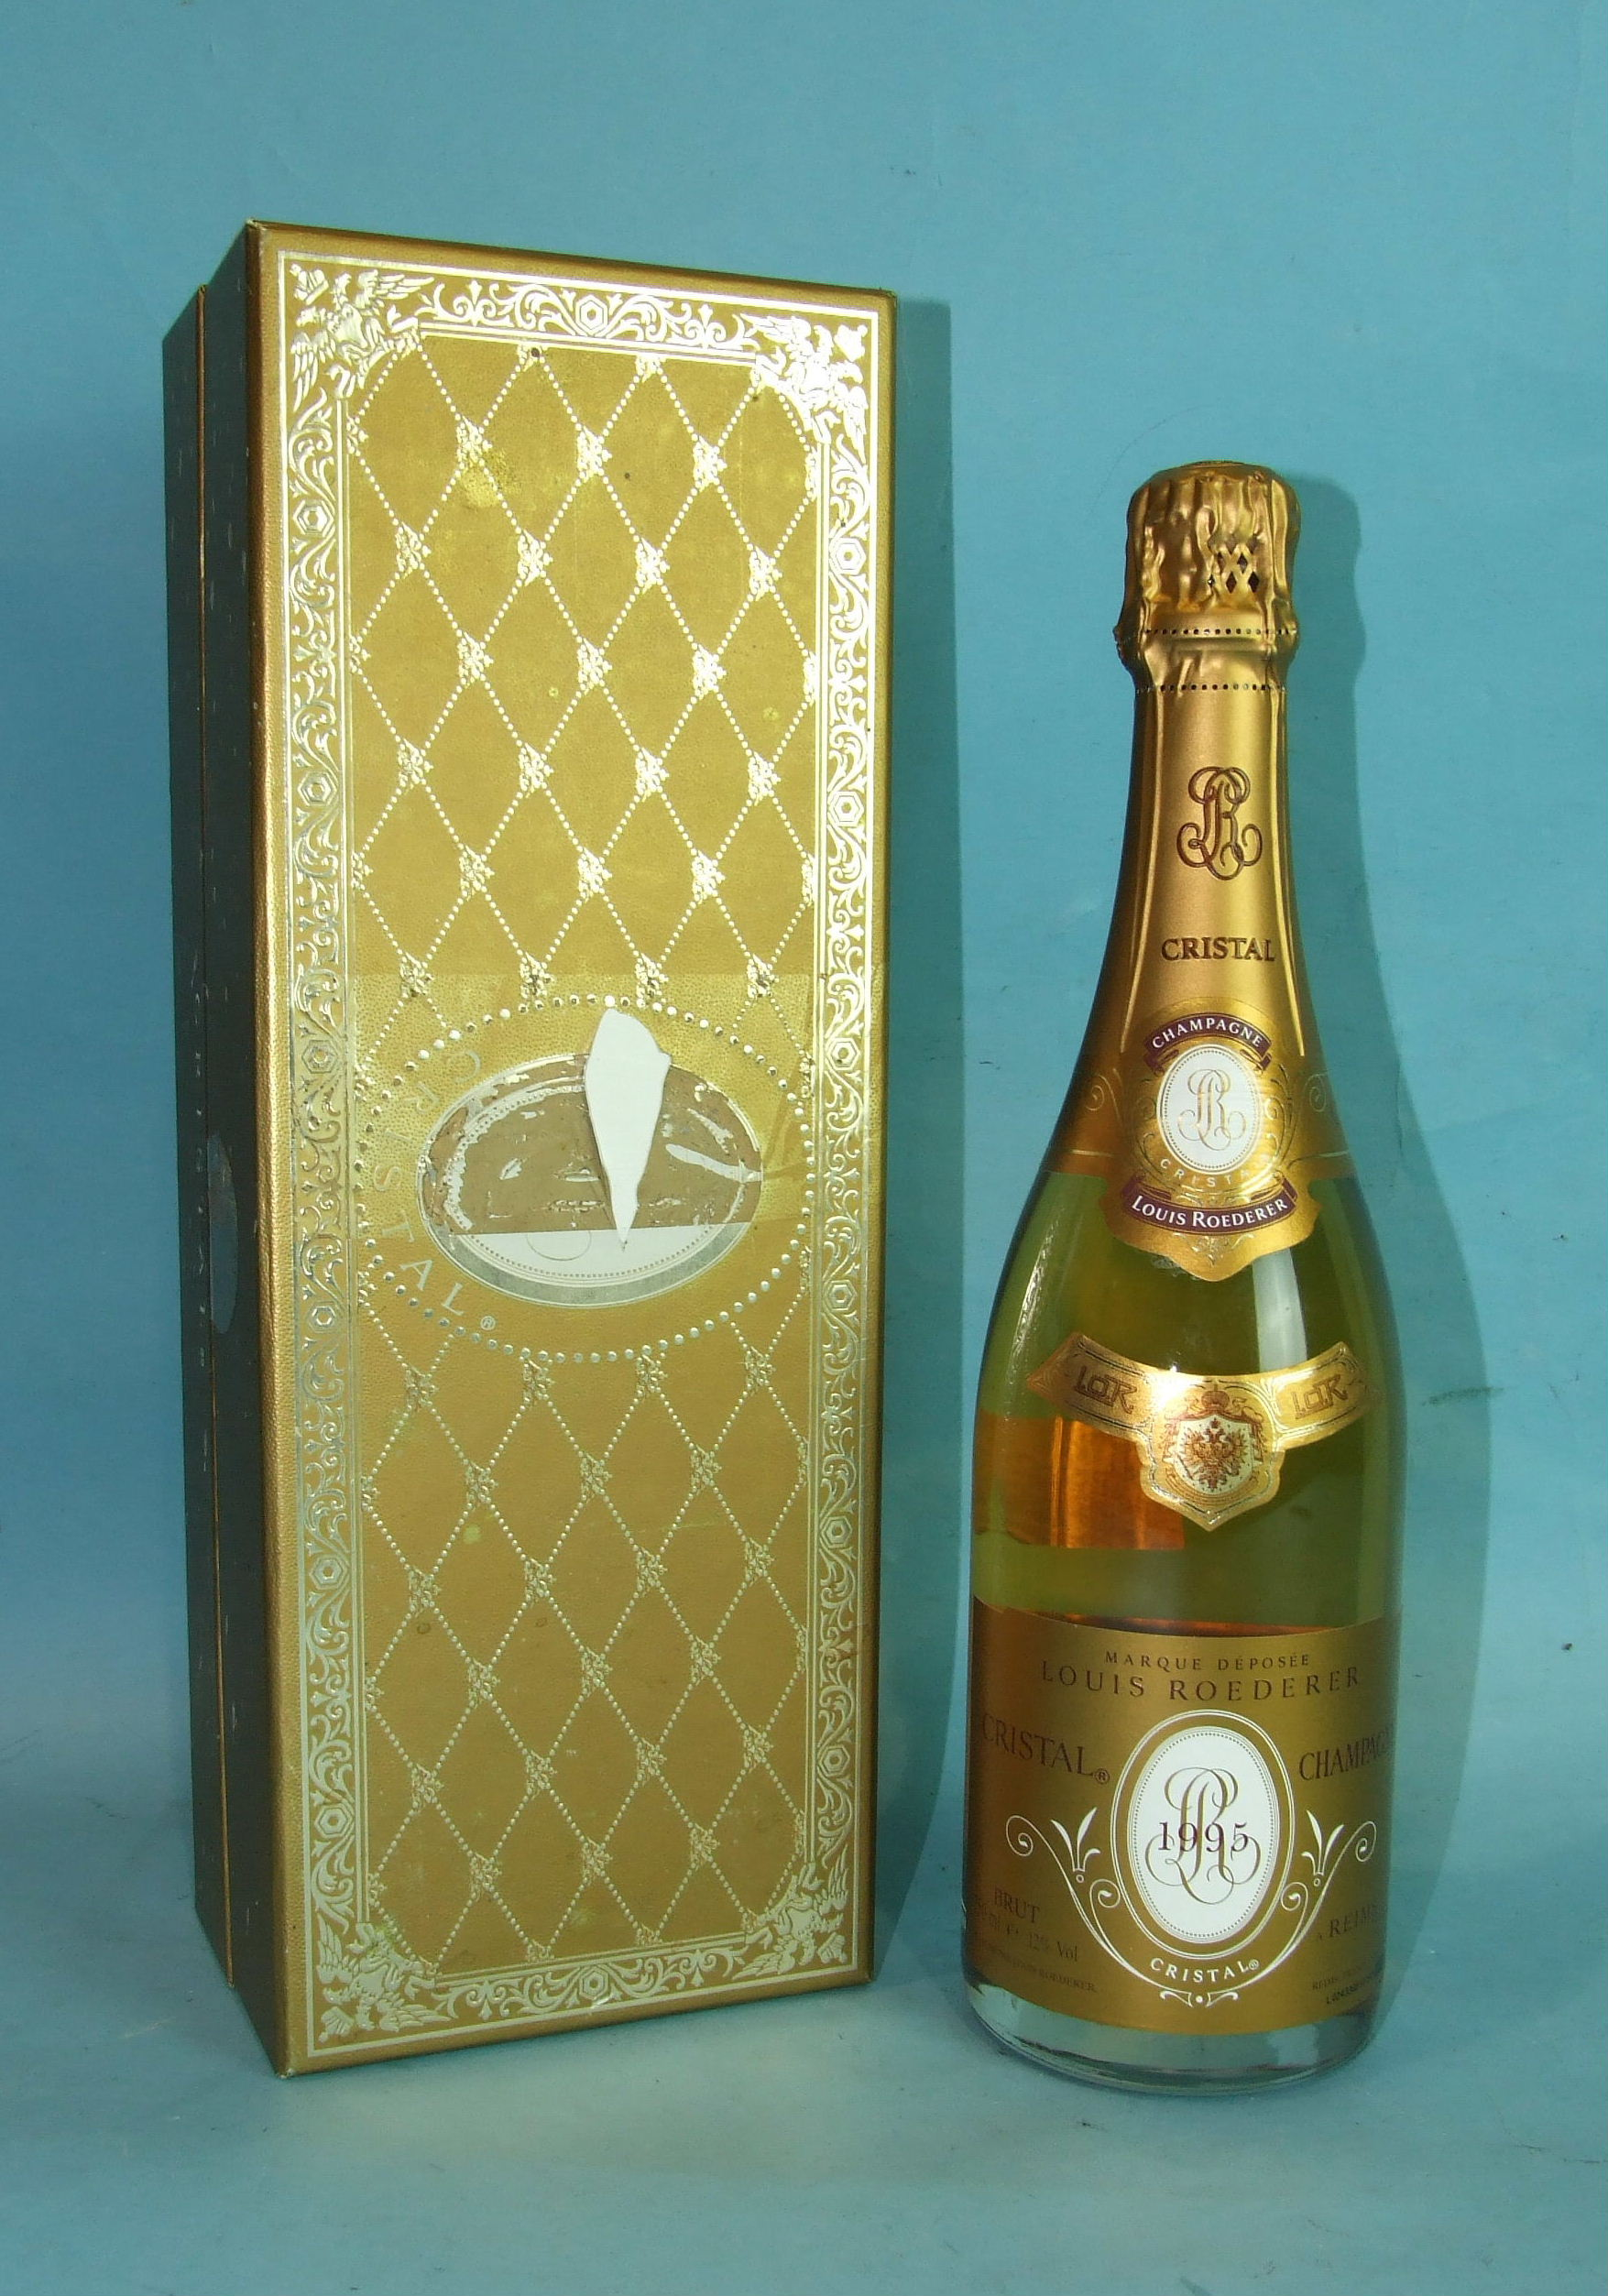 Lot 9 - Louis Roederer Cristal Champagne 1995, 750ml, 12%, in cardboard box.